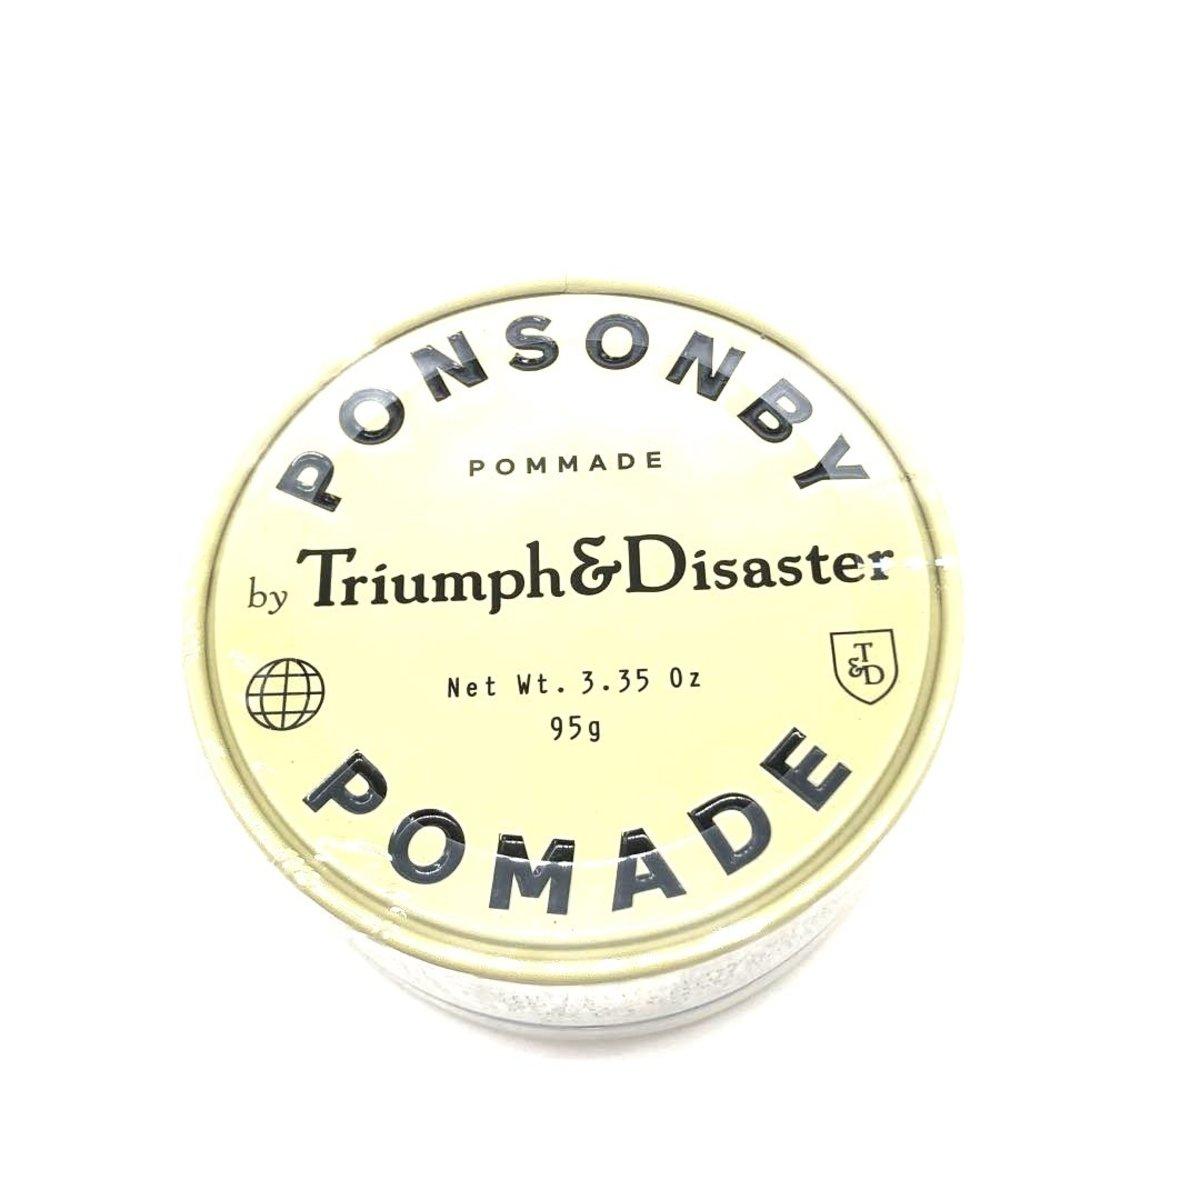 臭美男 髮膠 Triumph & Disaster Ponsonby Pomade 95G